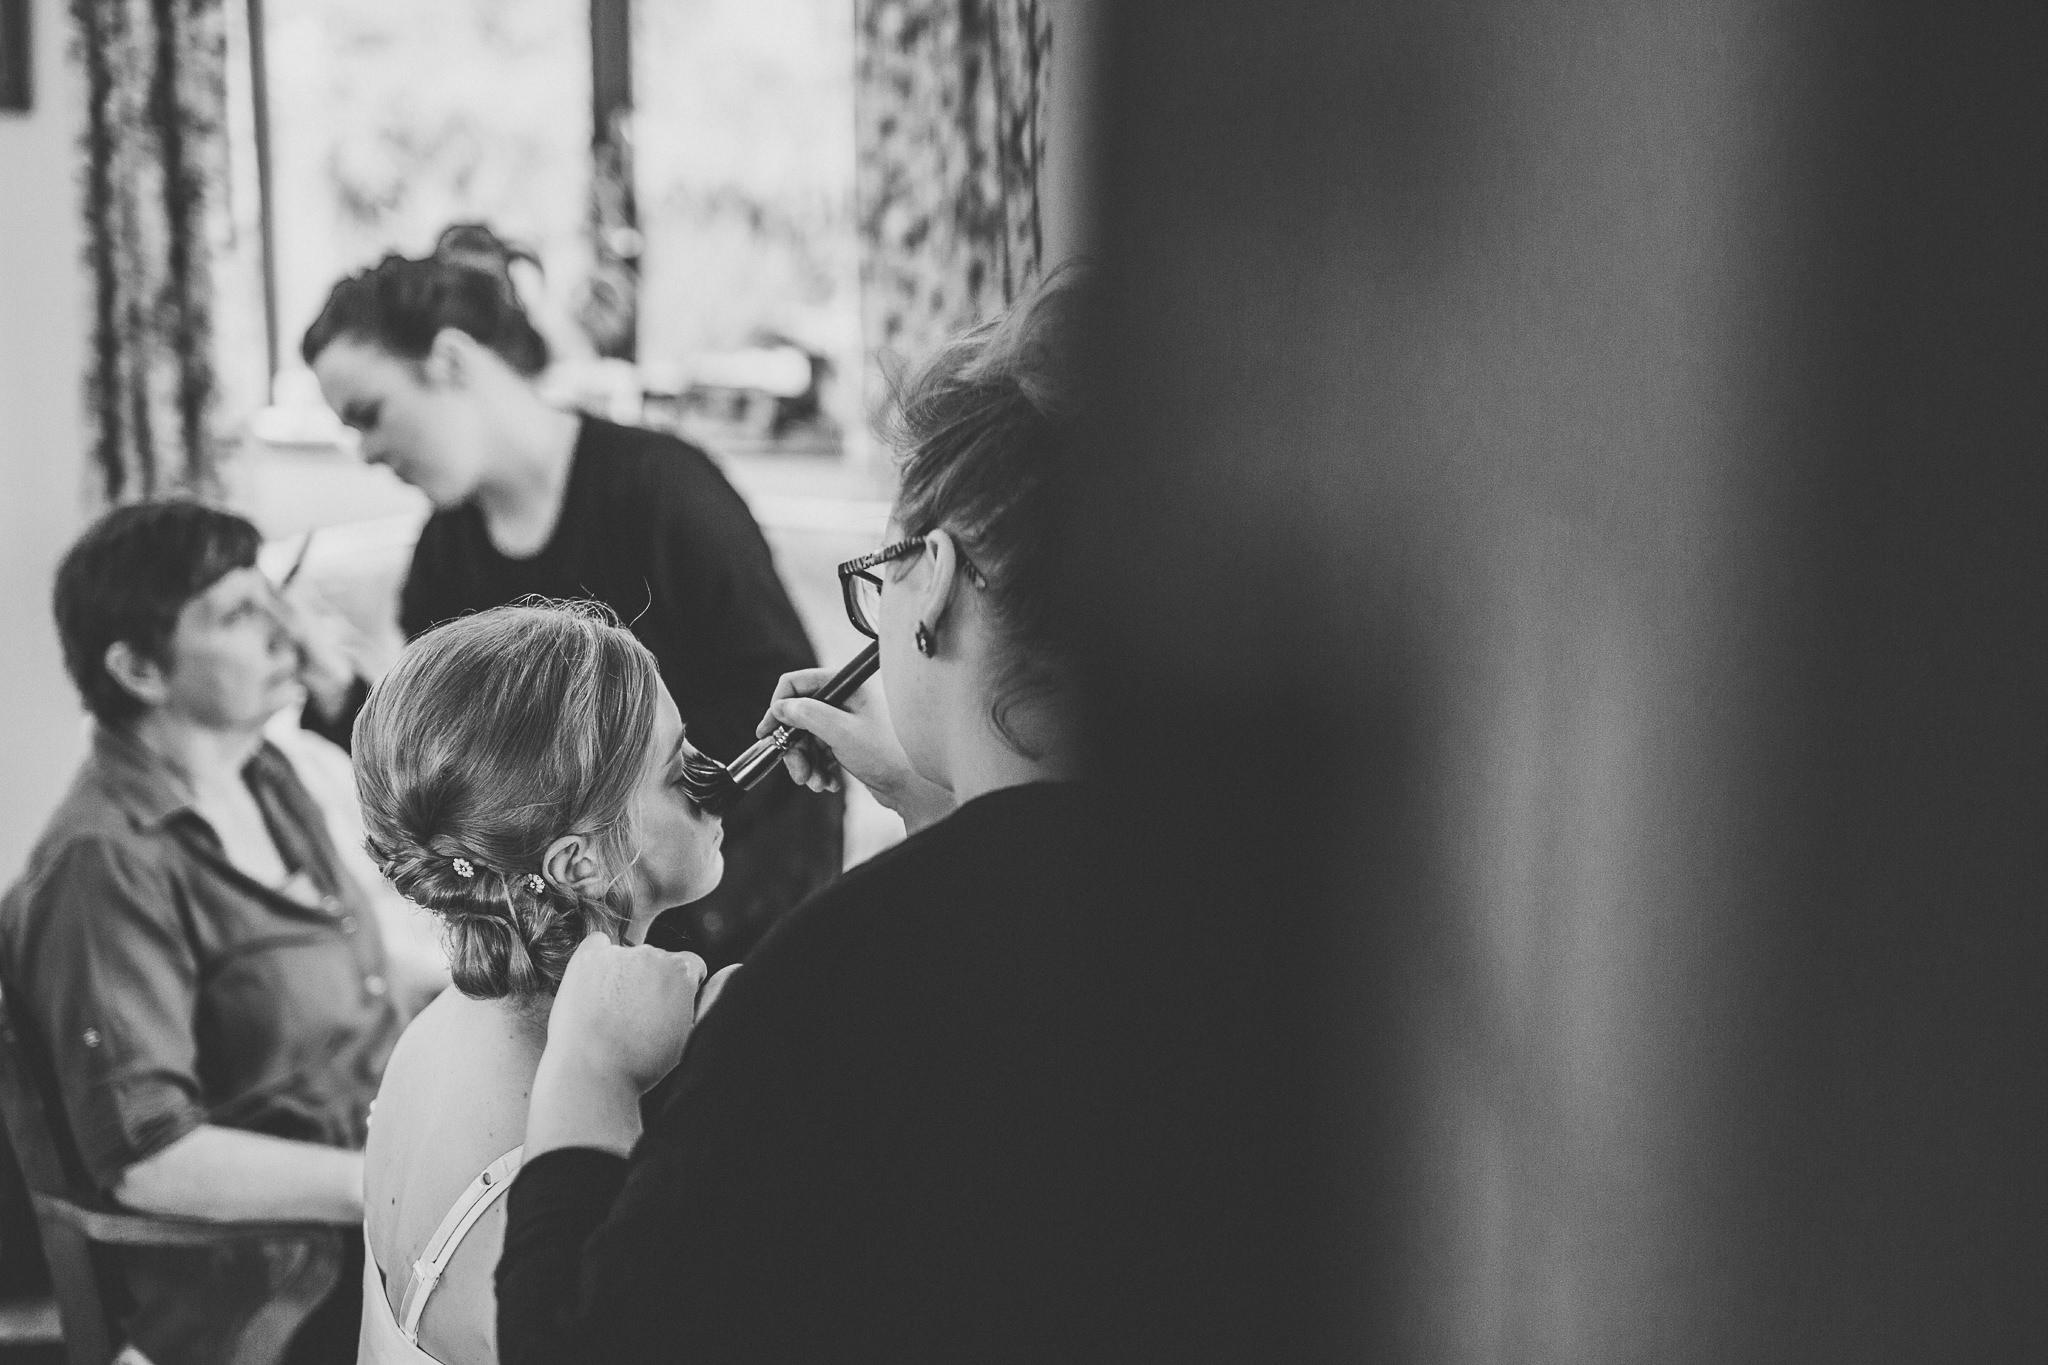 plas-isaf-corwen-north wales wedding-photography-photographer-91003